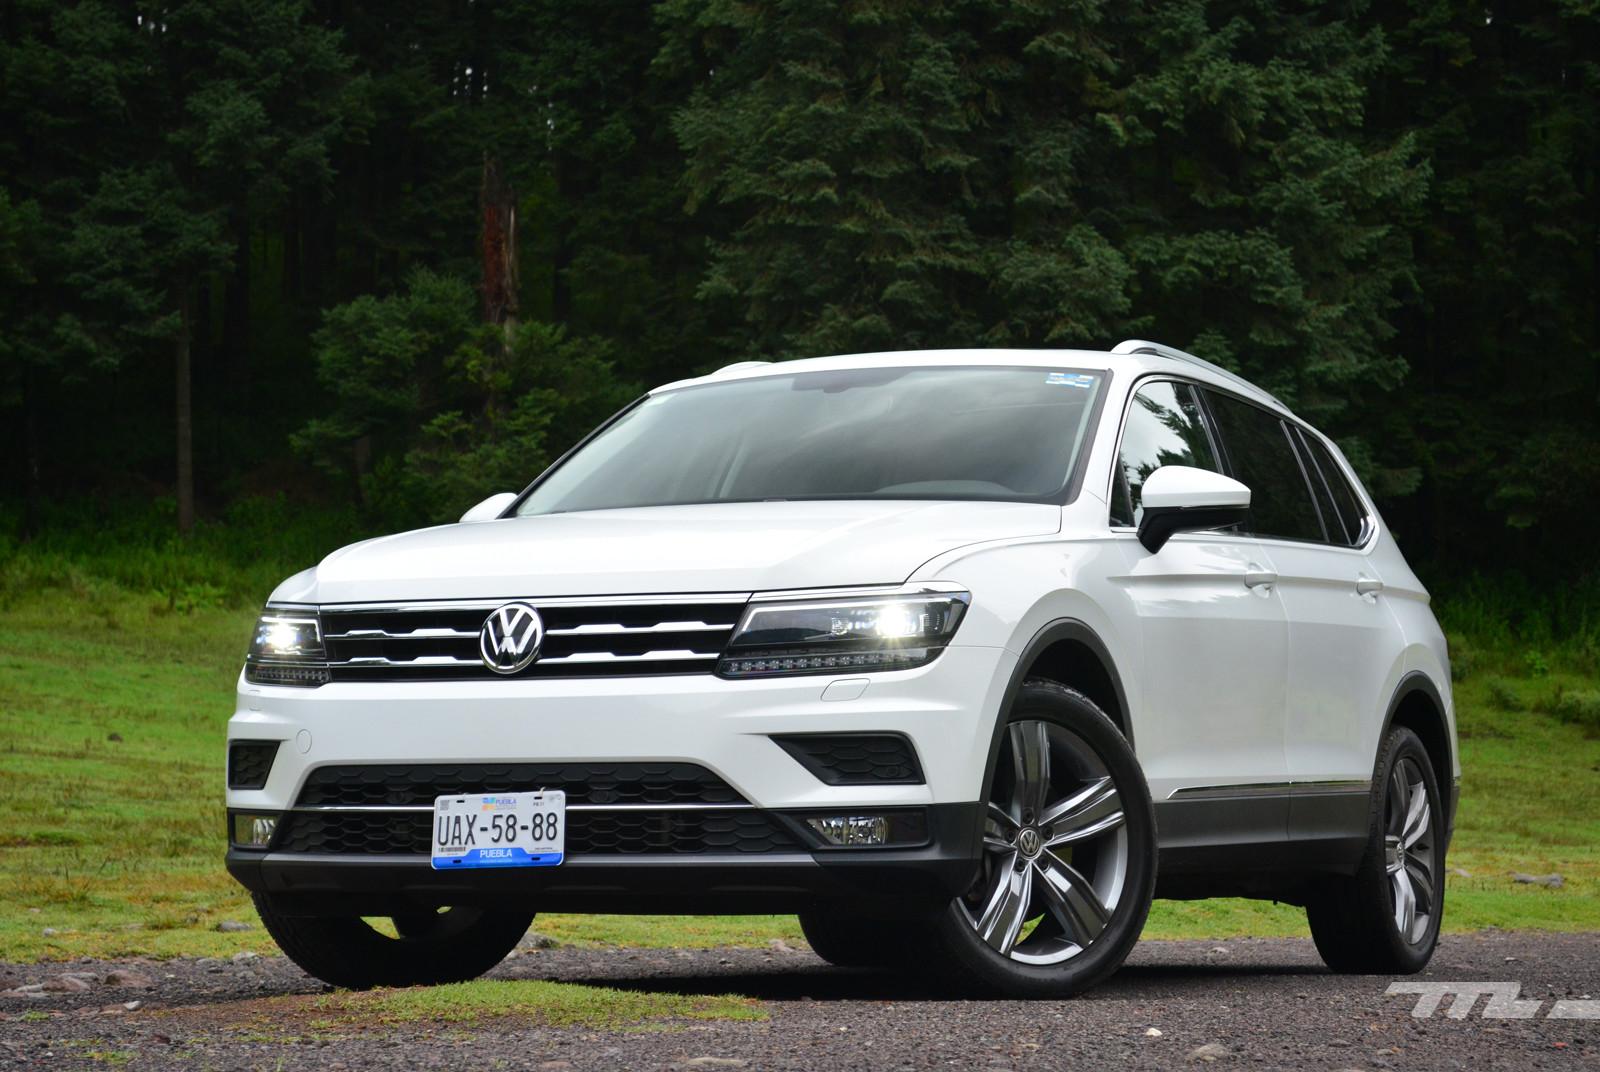 Foto de Volkswagen Tiguan 2.0 TSI (prueba) (4/23)